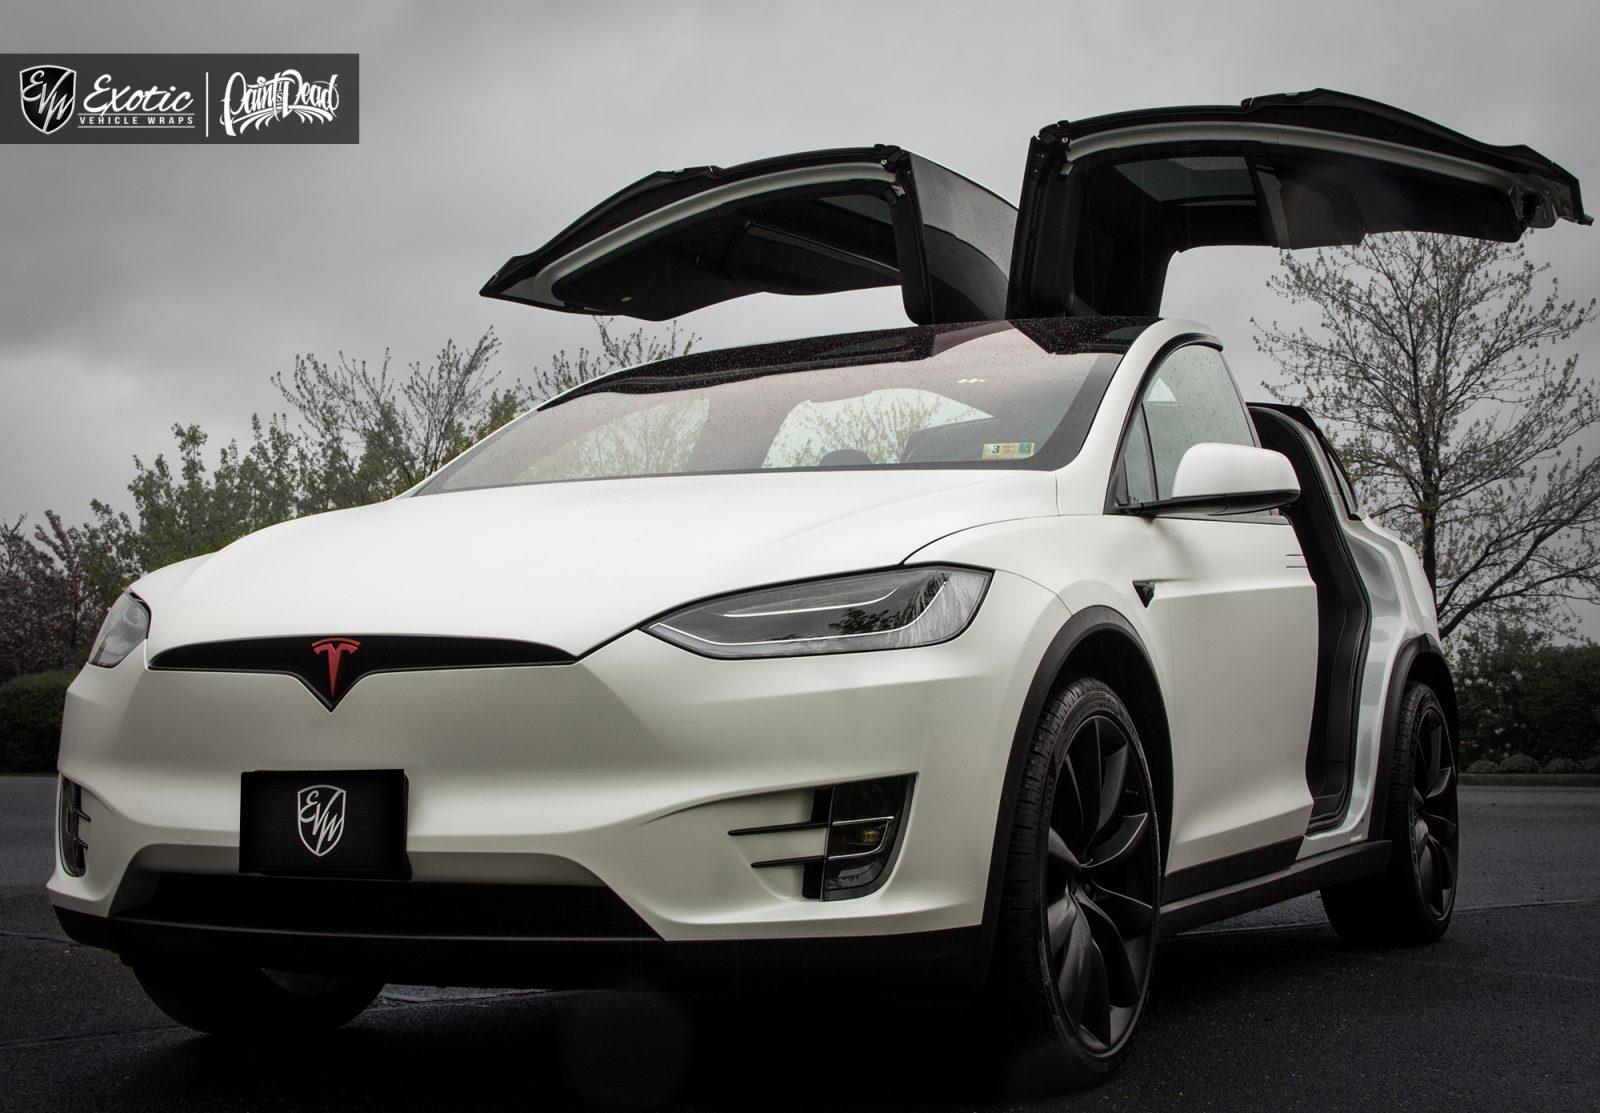 Tesla Model S Custom >> Vehicle Wraps, xPel and SunTek Paint Protection, Ceramic Pro Certified